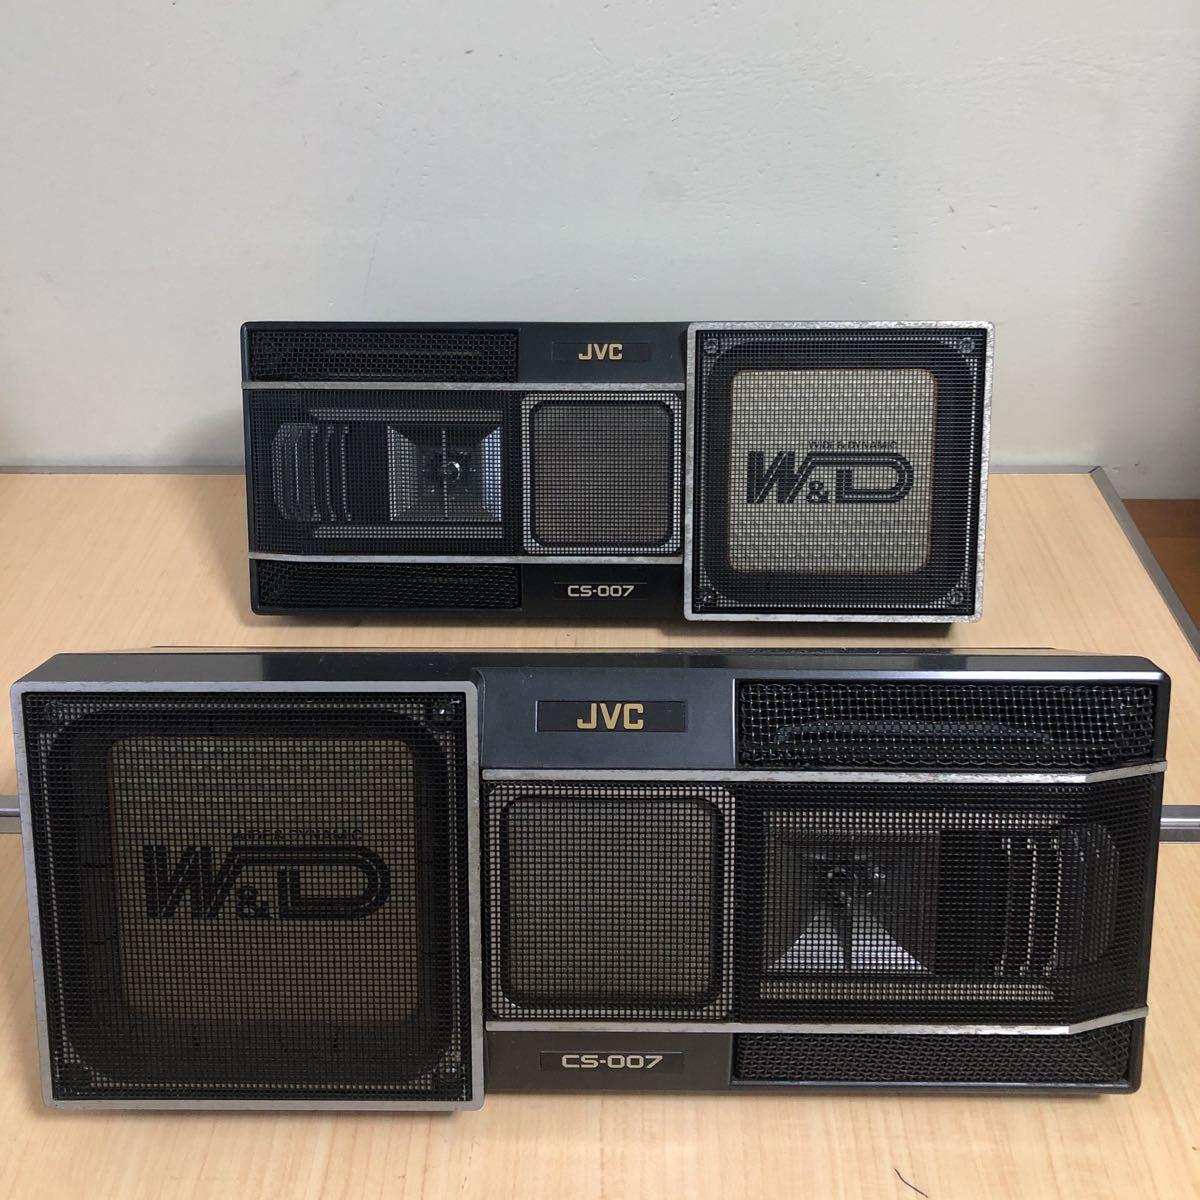 JVC KENWOOD ケンウッド スピーカー CS-007 旧車 当時物 (ジャンク扱い)